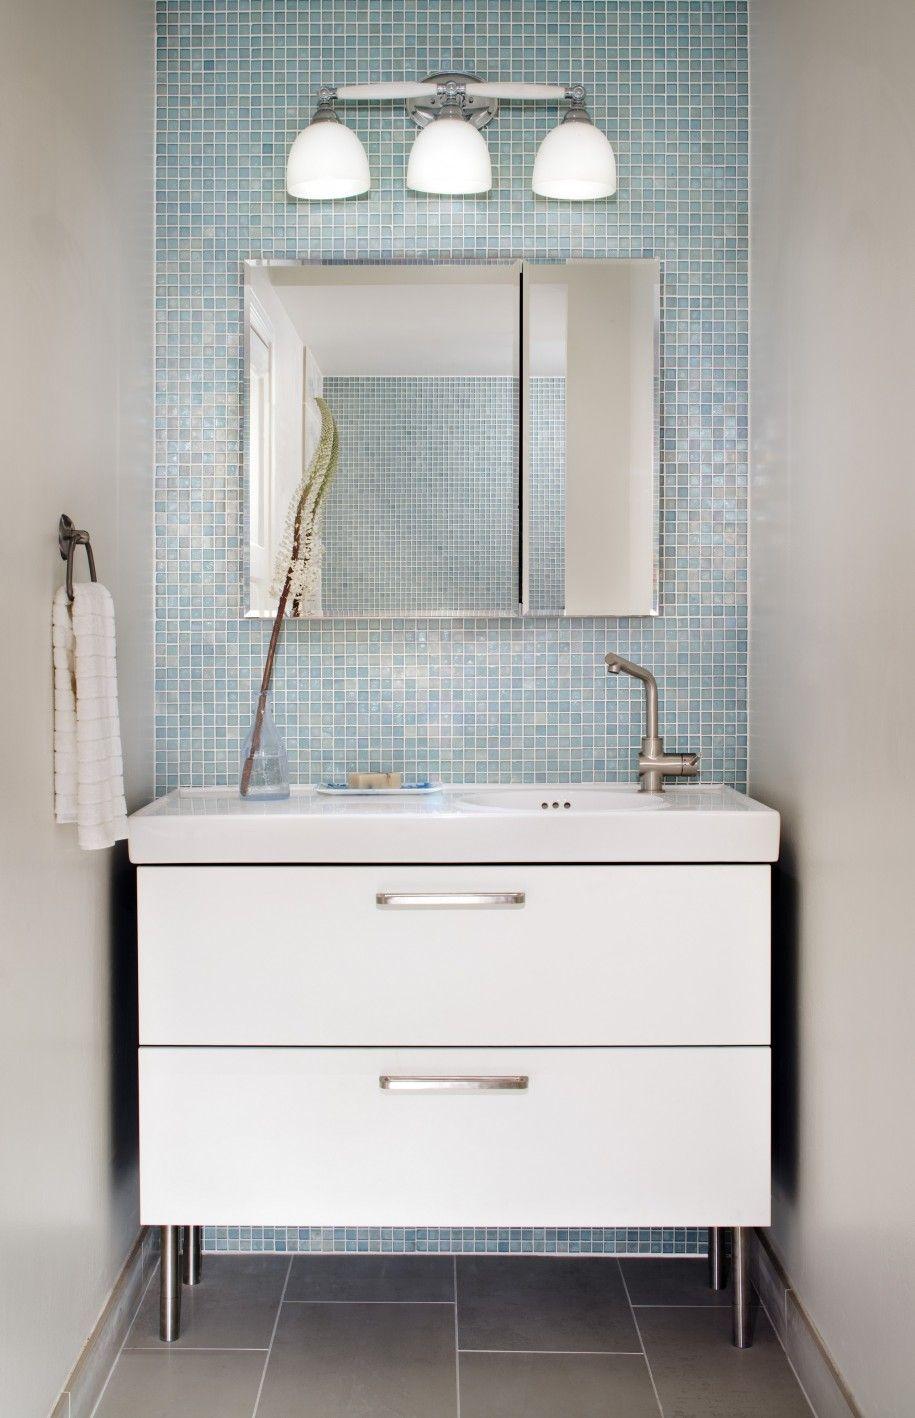 Furniture White Ancient Style Furniture Bathroom Design Idea With